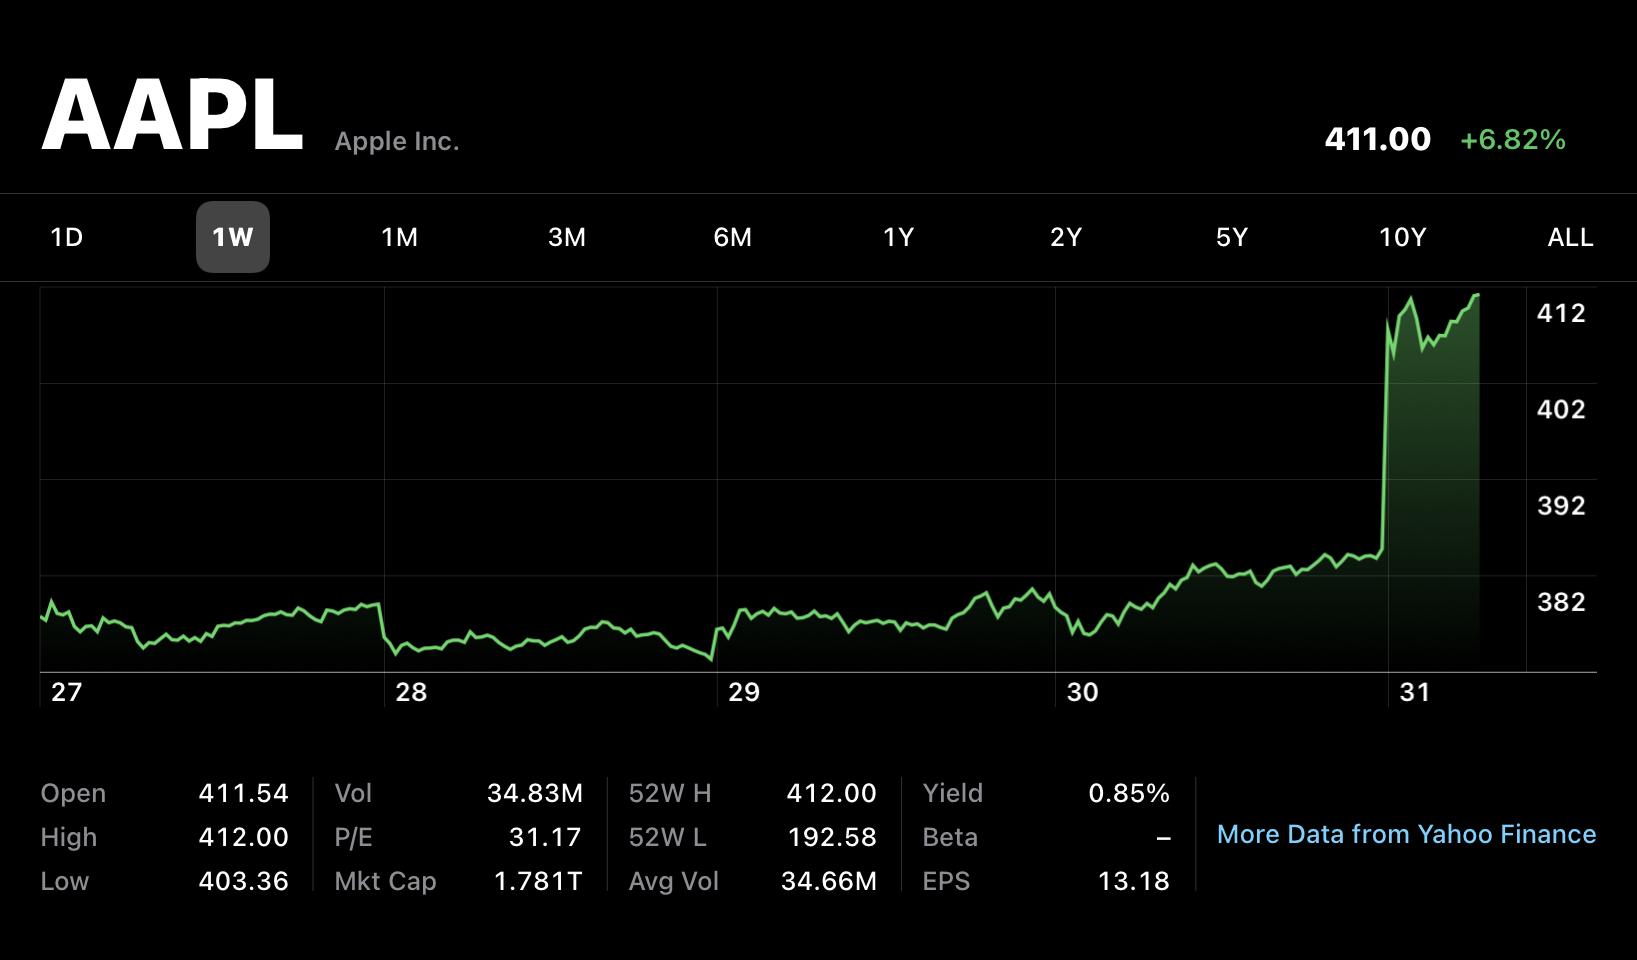 Apple overtakes Saudi Aramco as world's most valuable company, nearing $2 trillion market cap